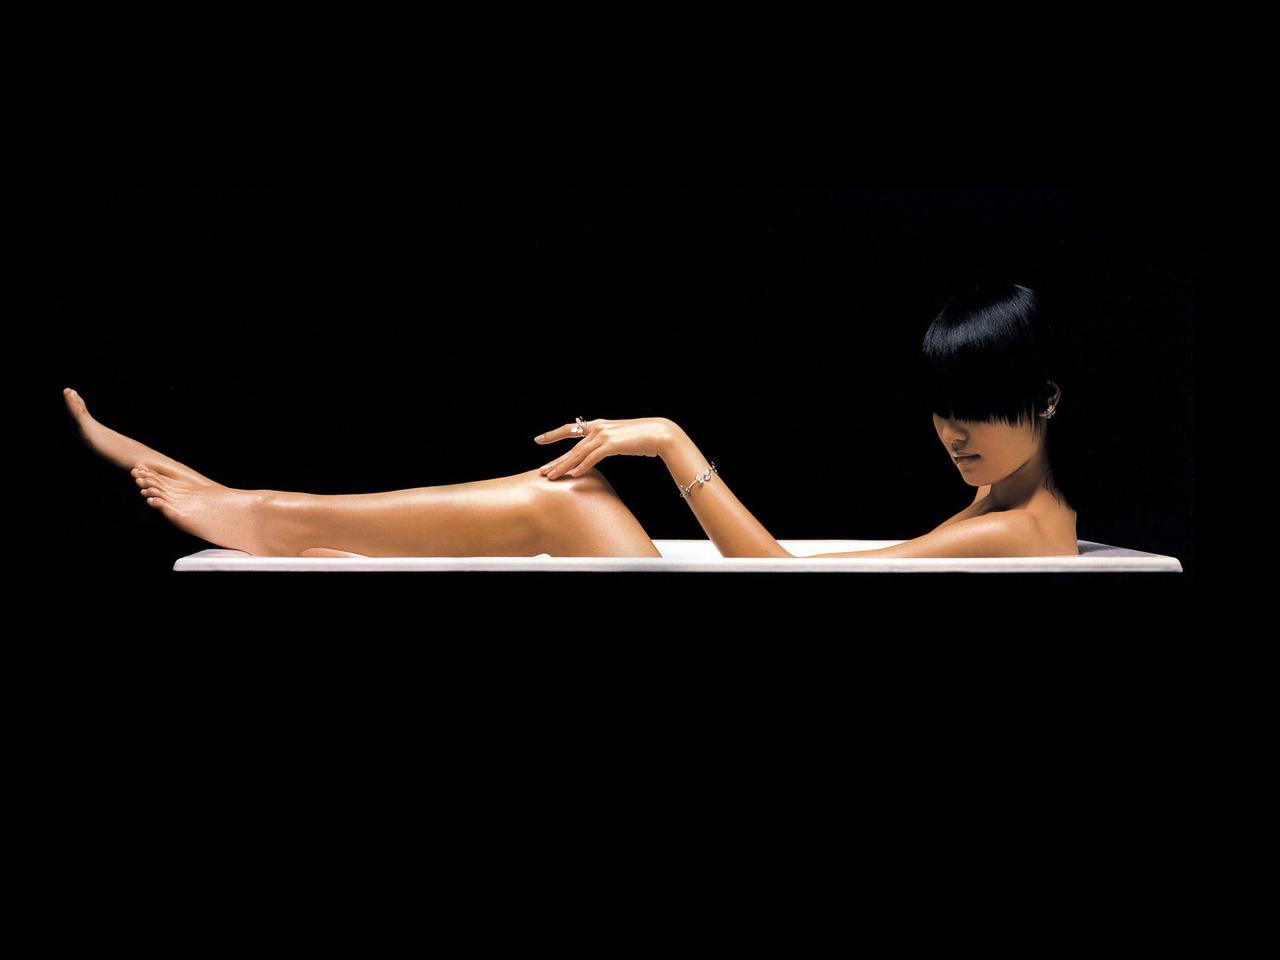 R c nude pics